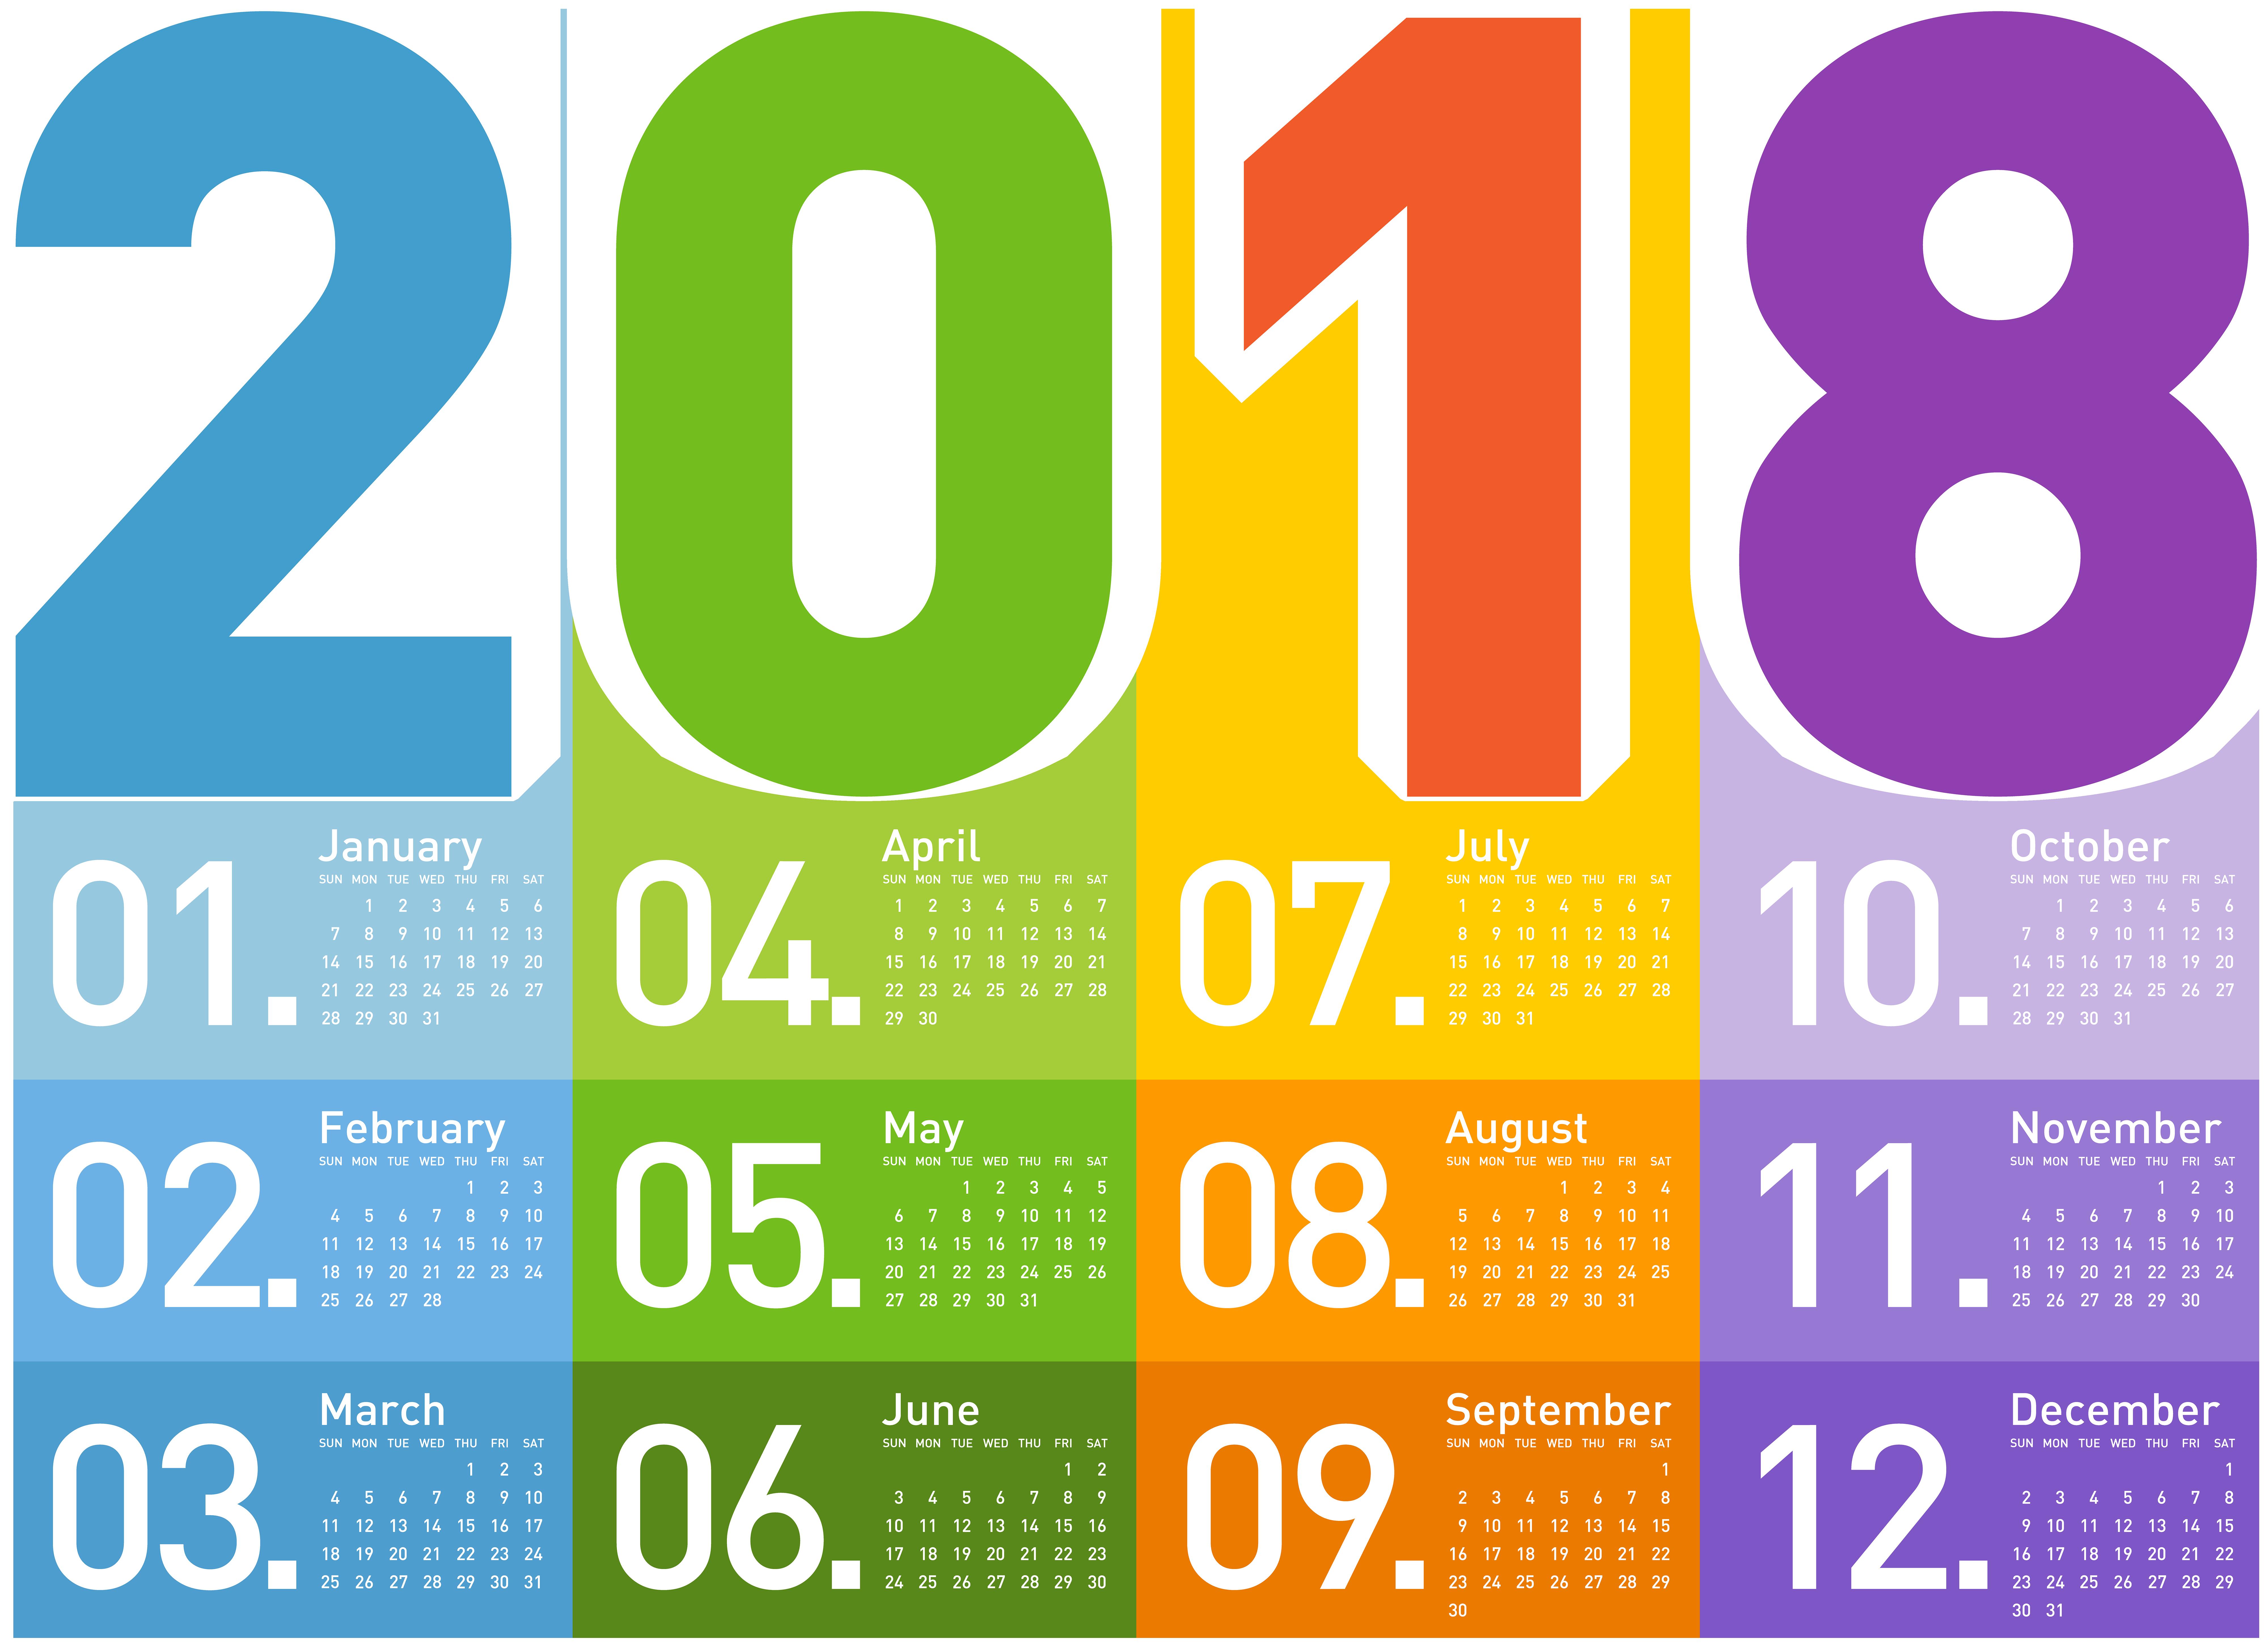 transparent png image. Clipart calendar april 2018